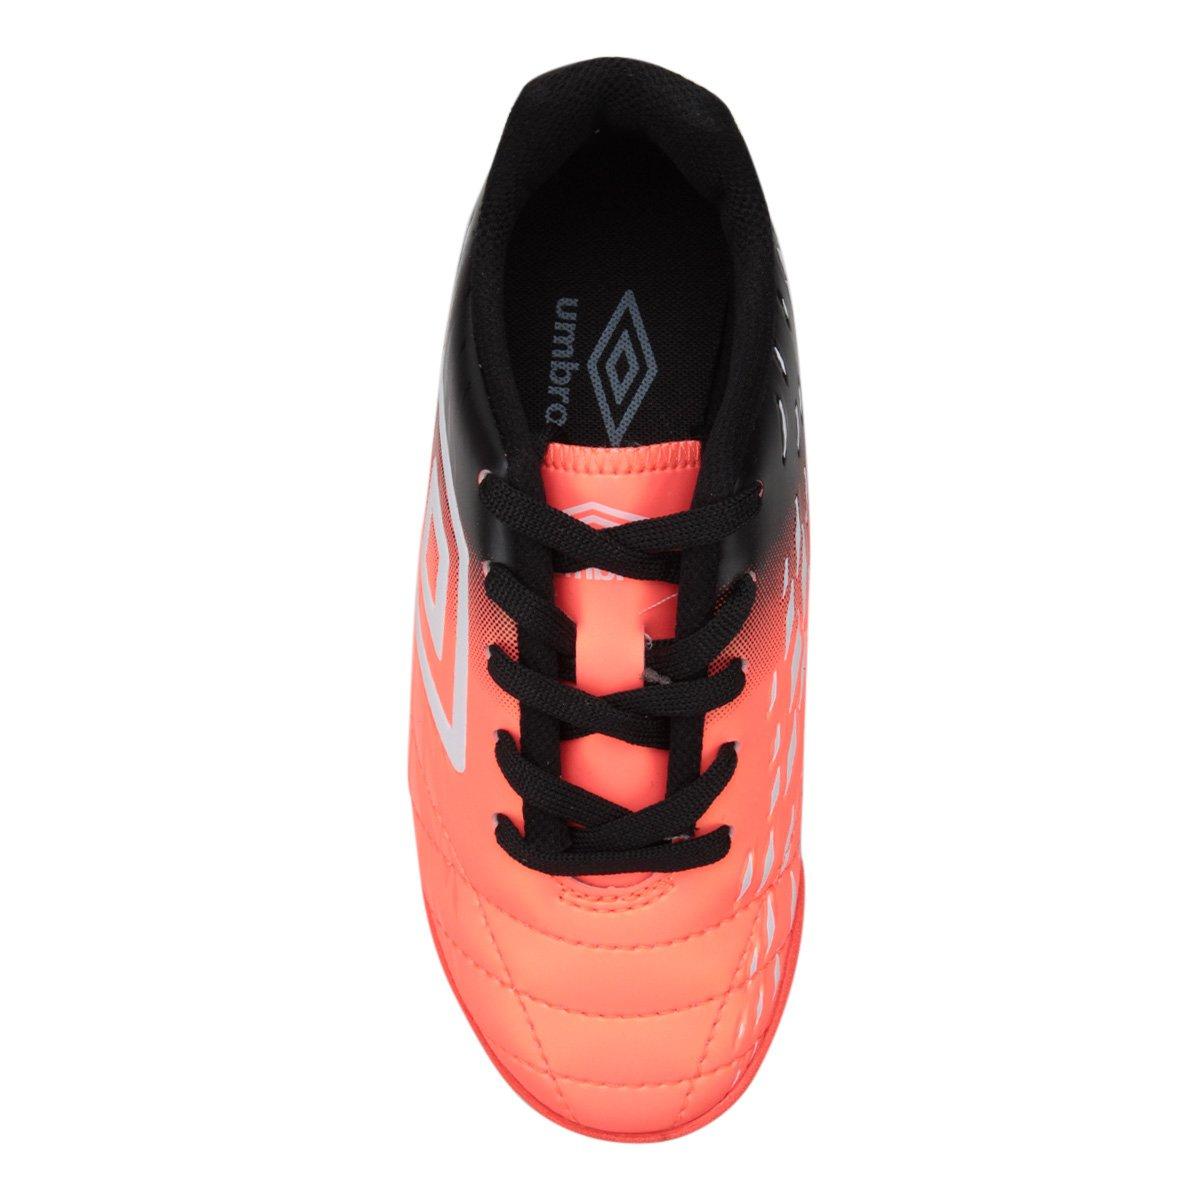 c339ed742f Chuteira Futsal Infantil Umbro Fifty II - Prata e Salmão - Compre ...